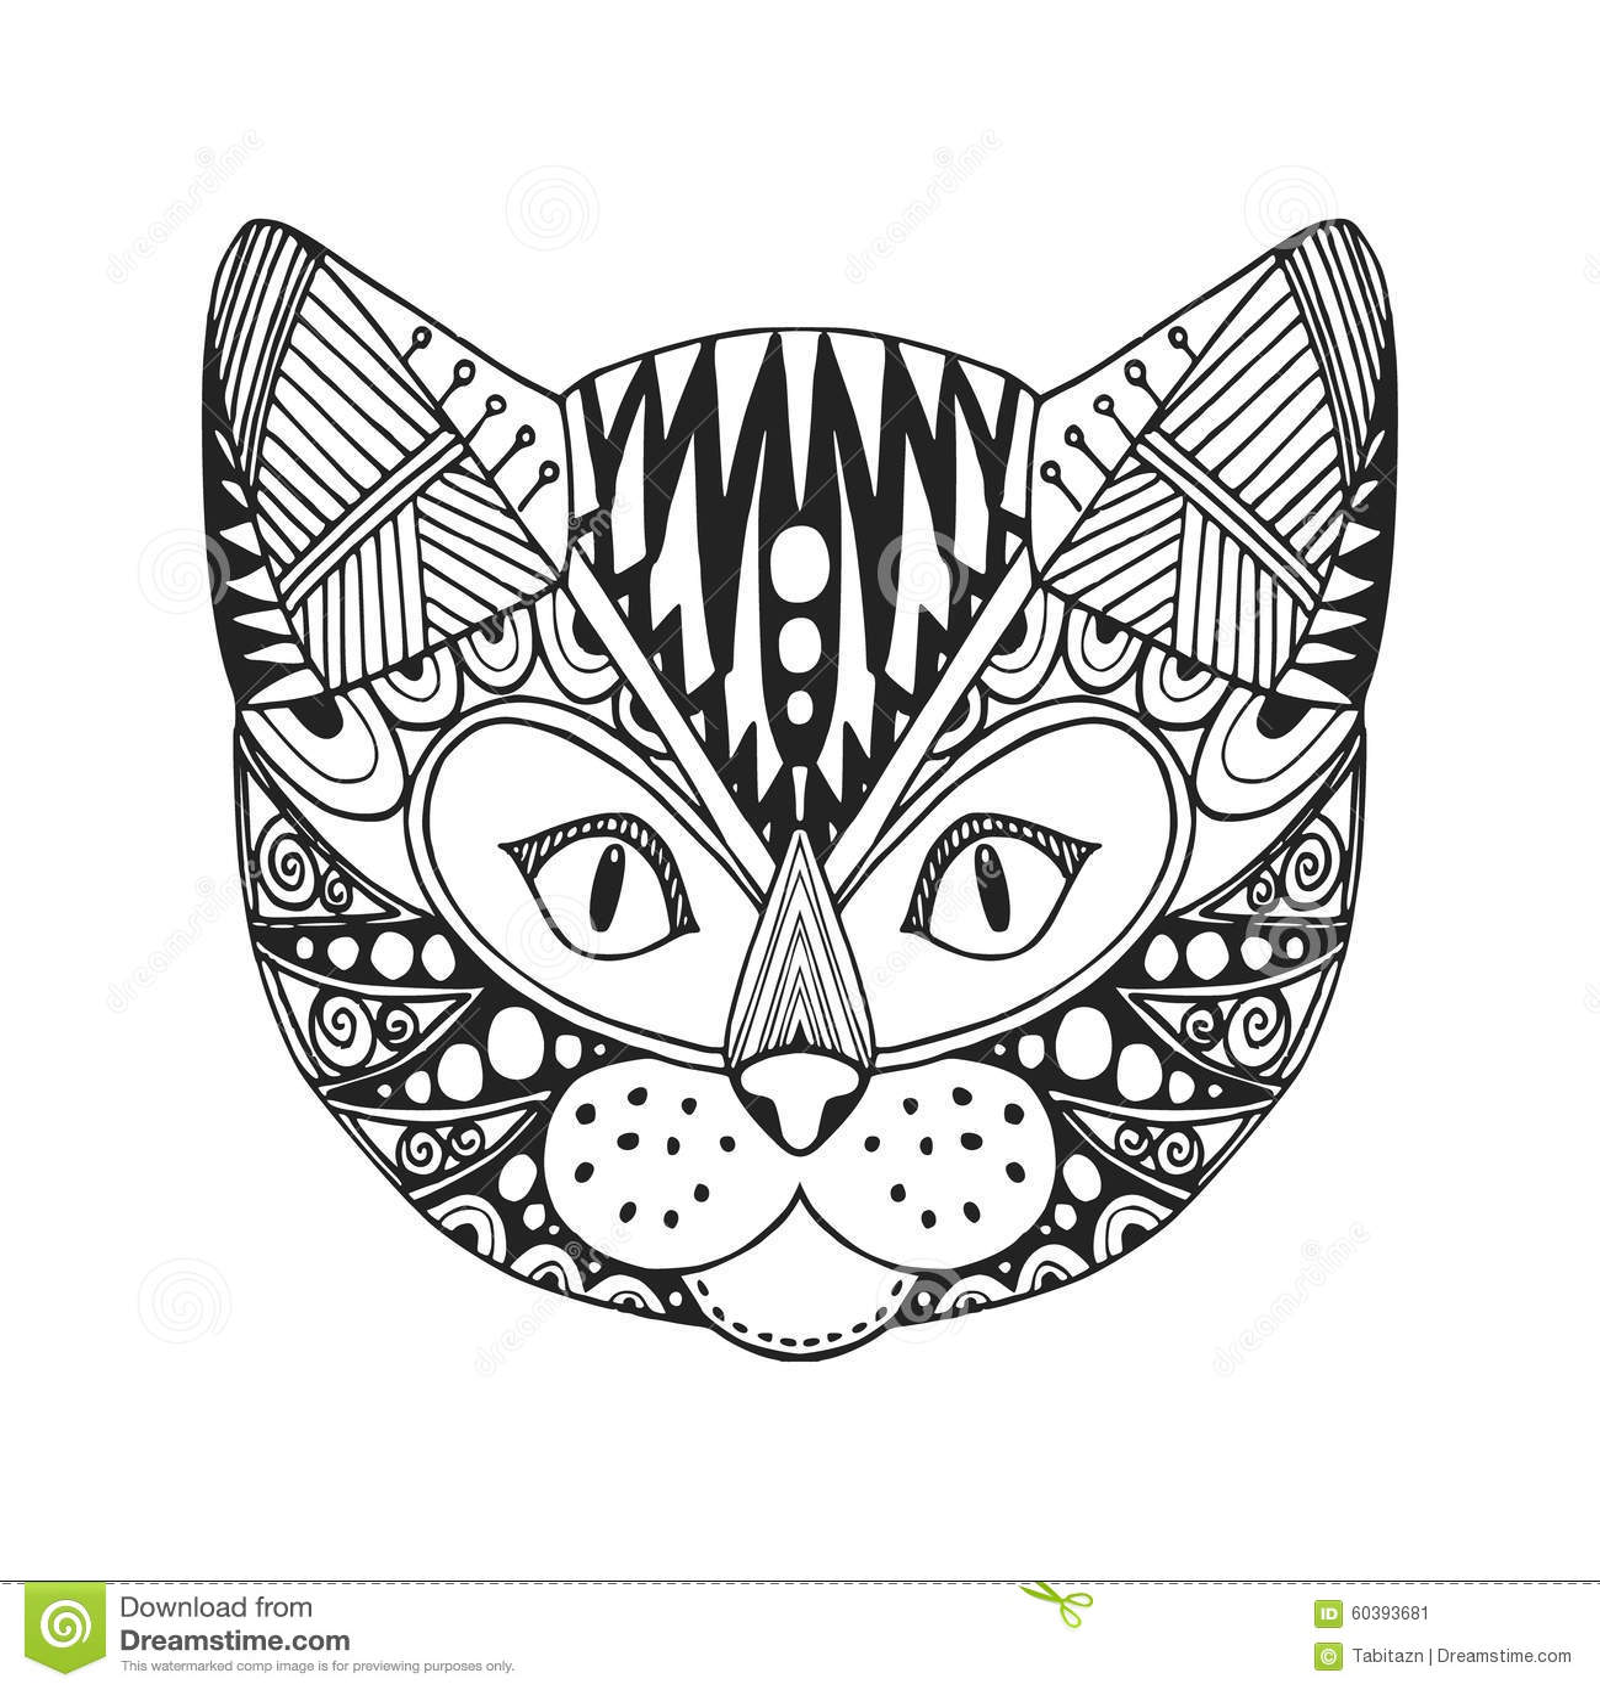 Ornamental Head Of Cat Trendy Ethnic Zentangle Design